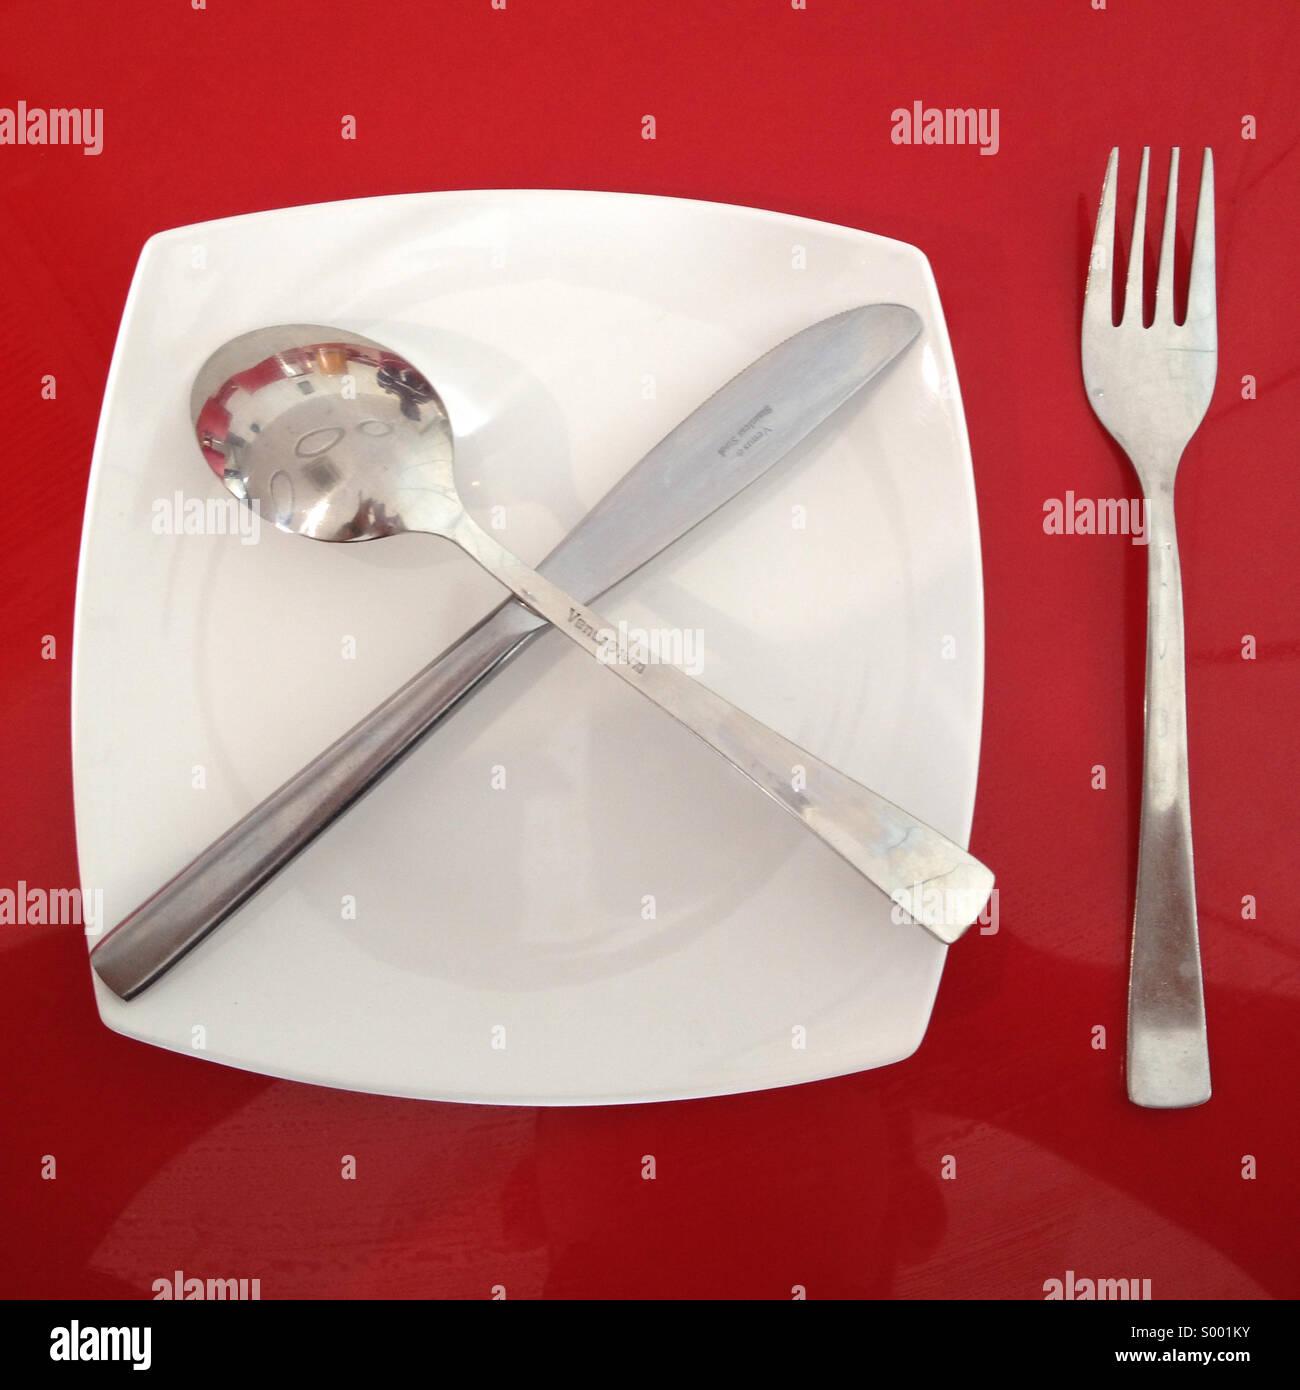 Foodiebill Immagini Stock